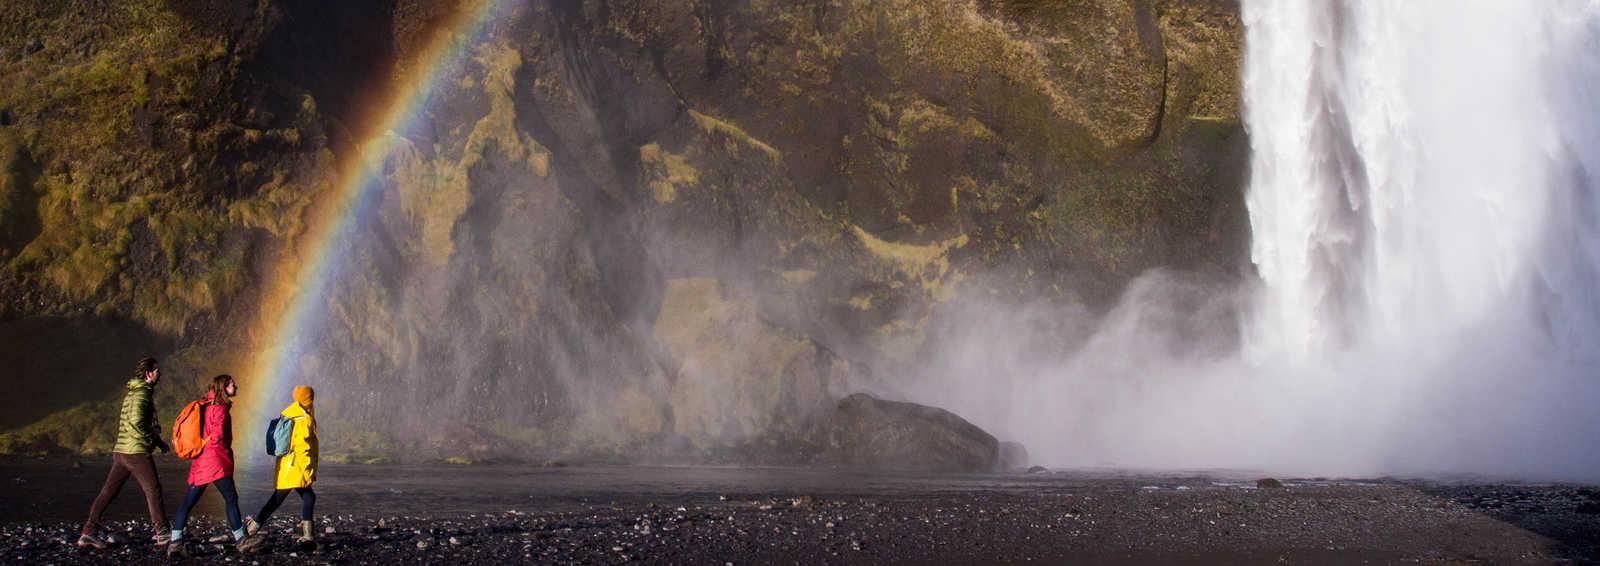 Trekkers at Skogafoss, Iceland